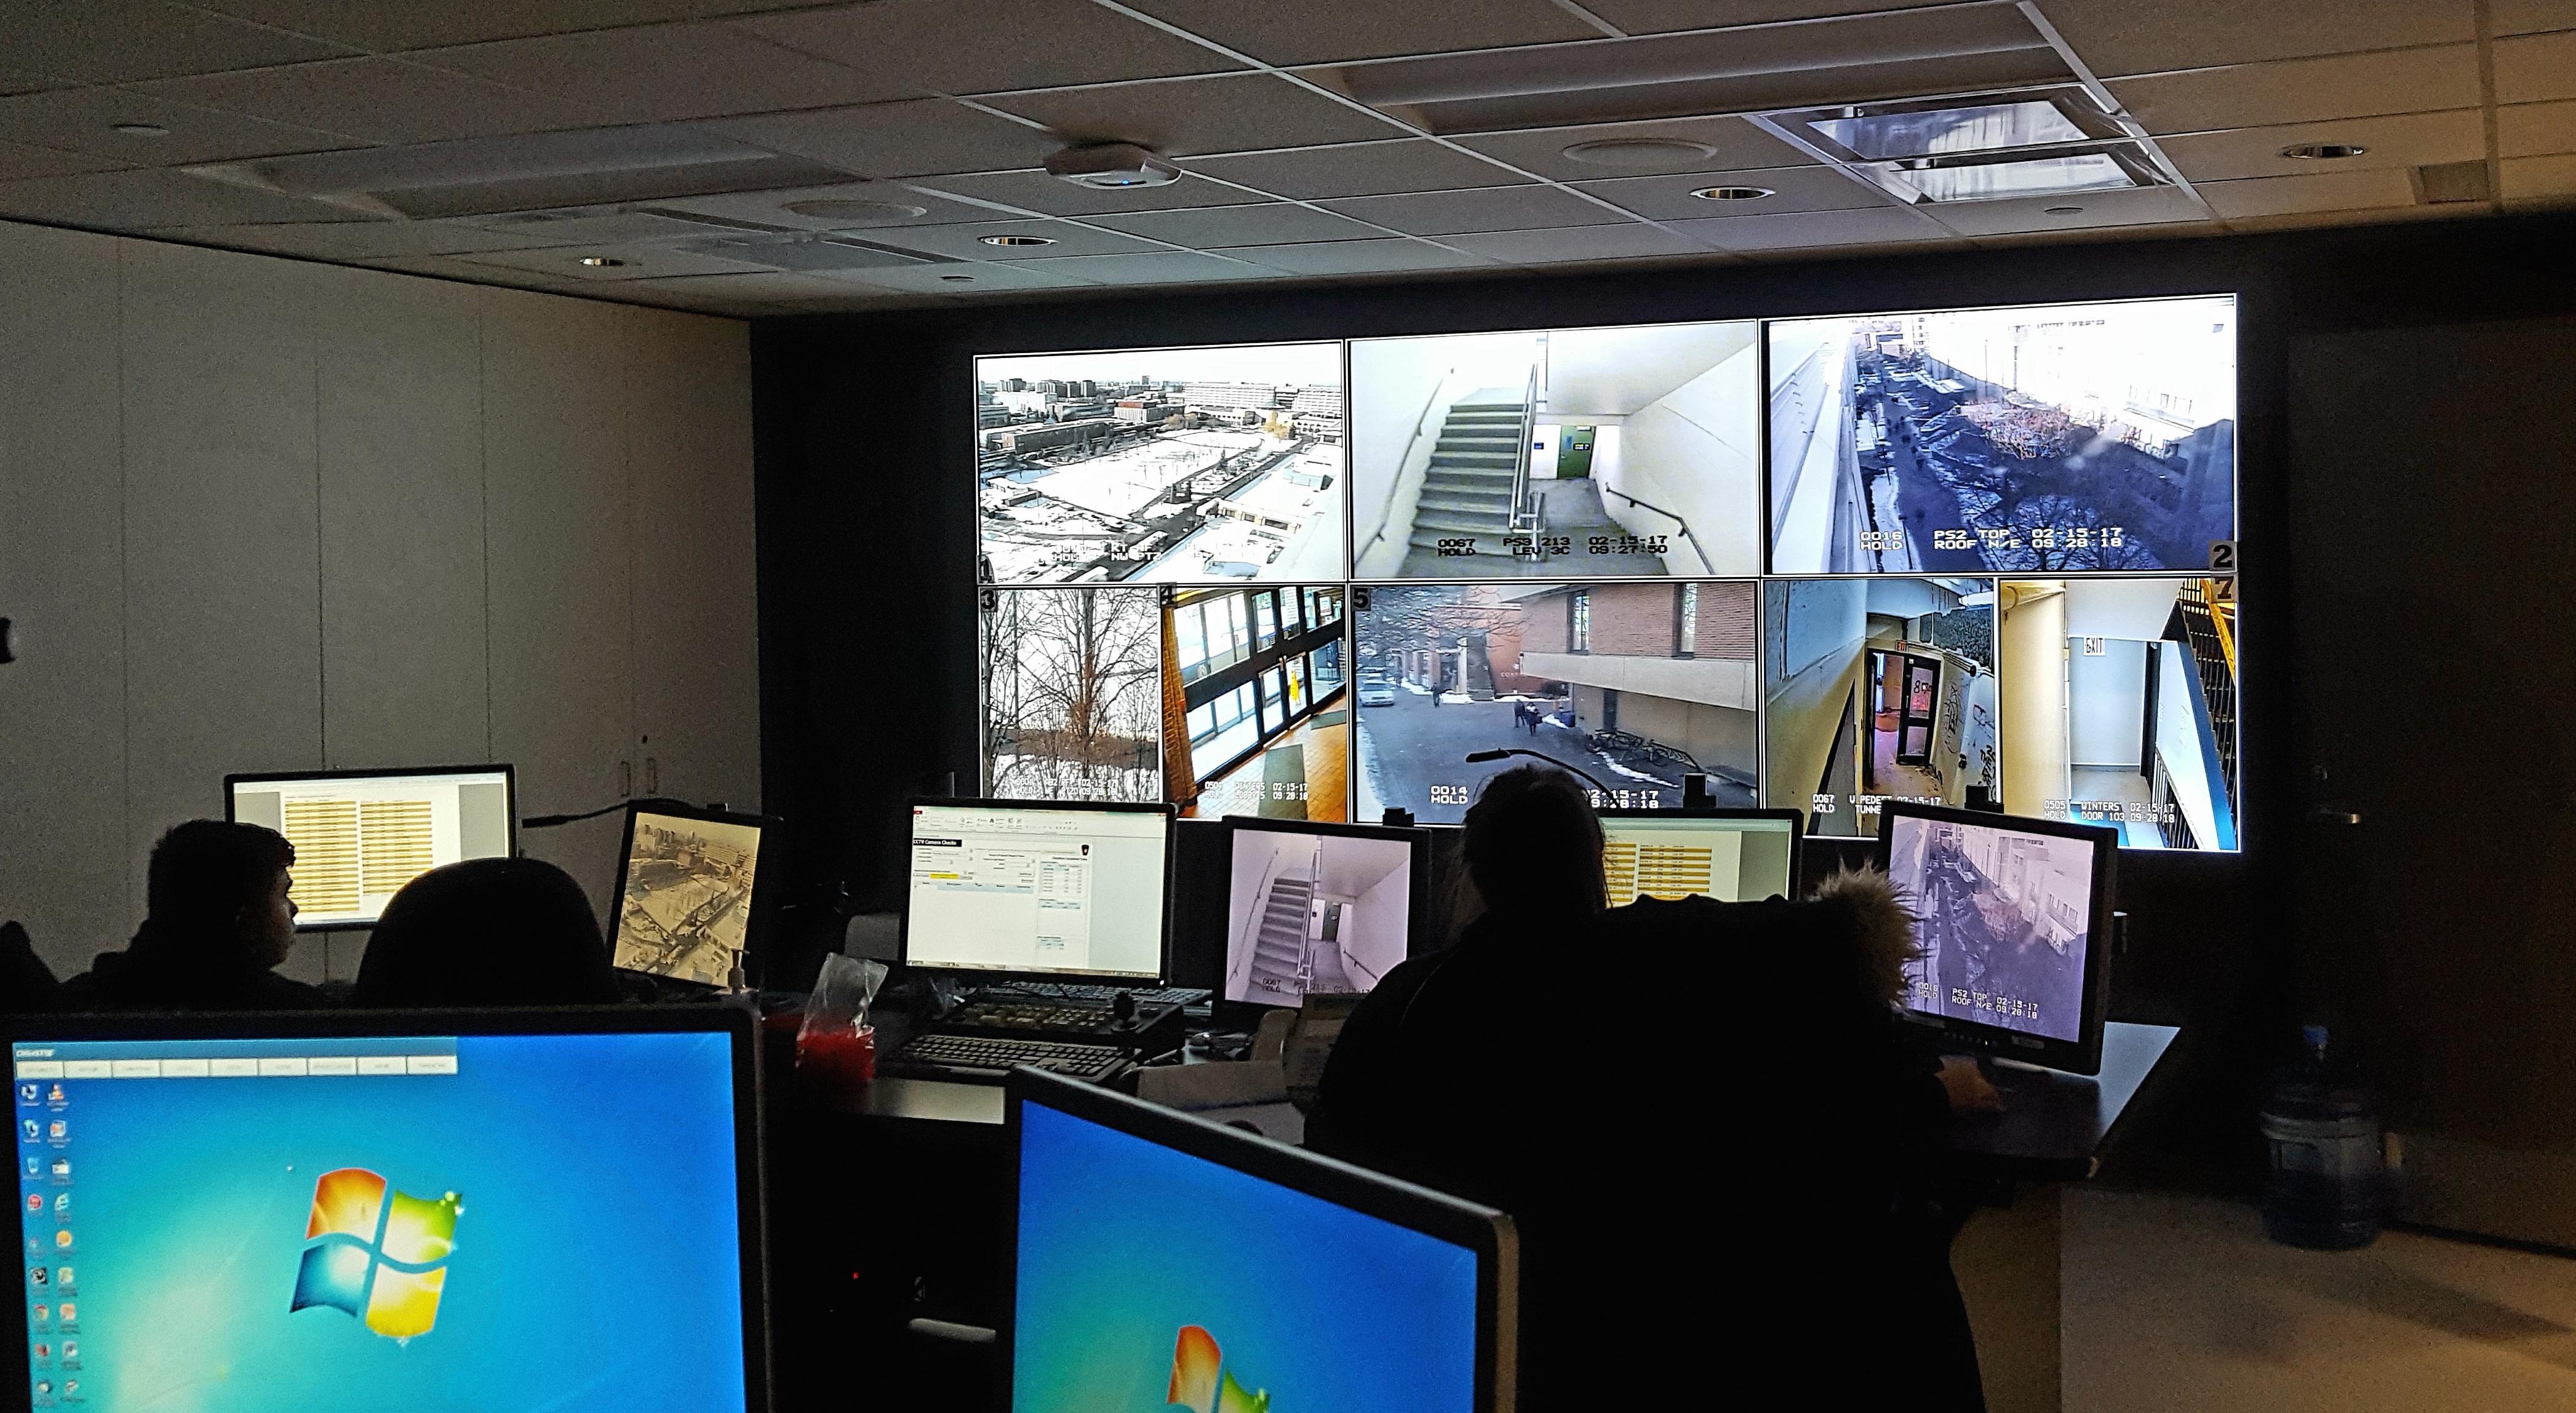 York University Security Control Centre